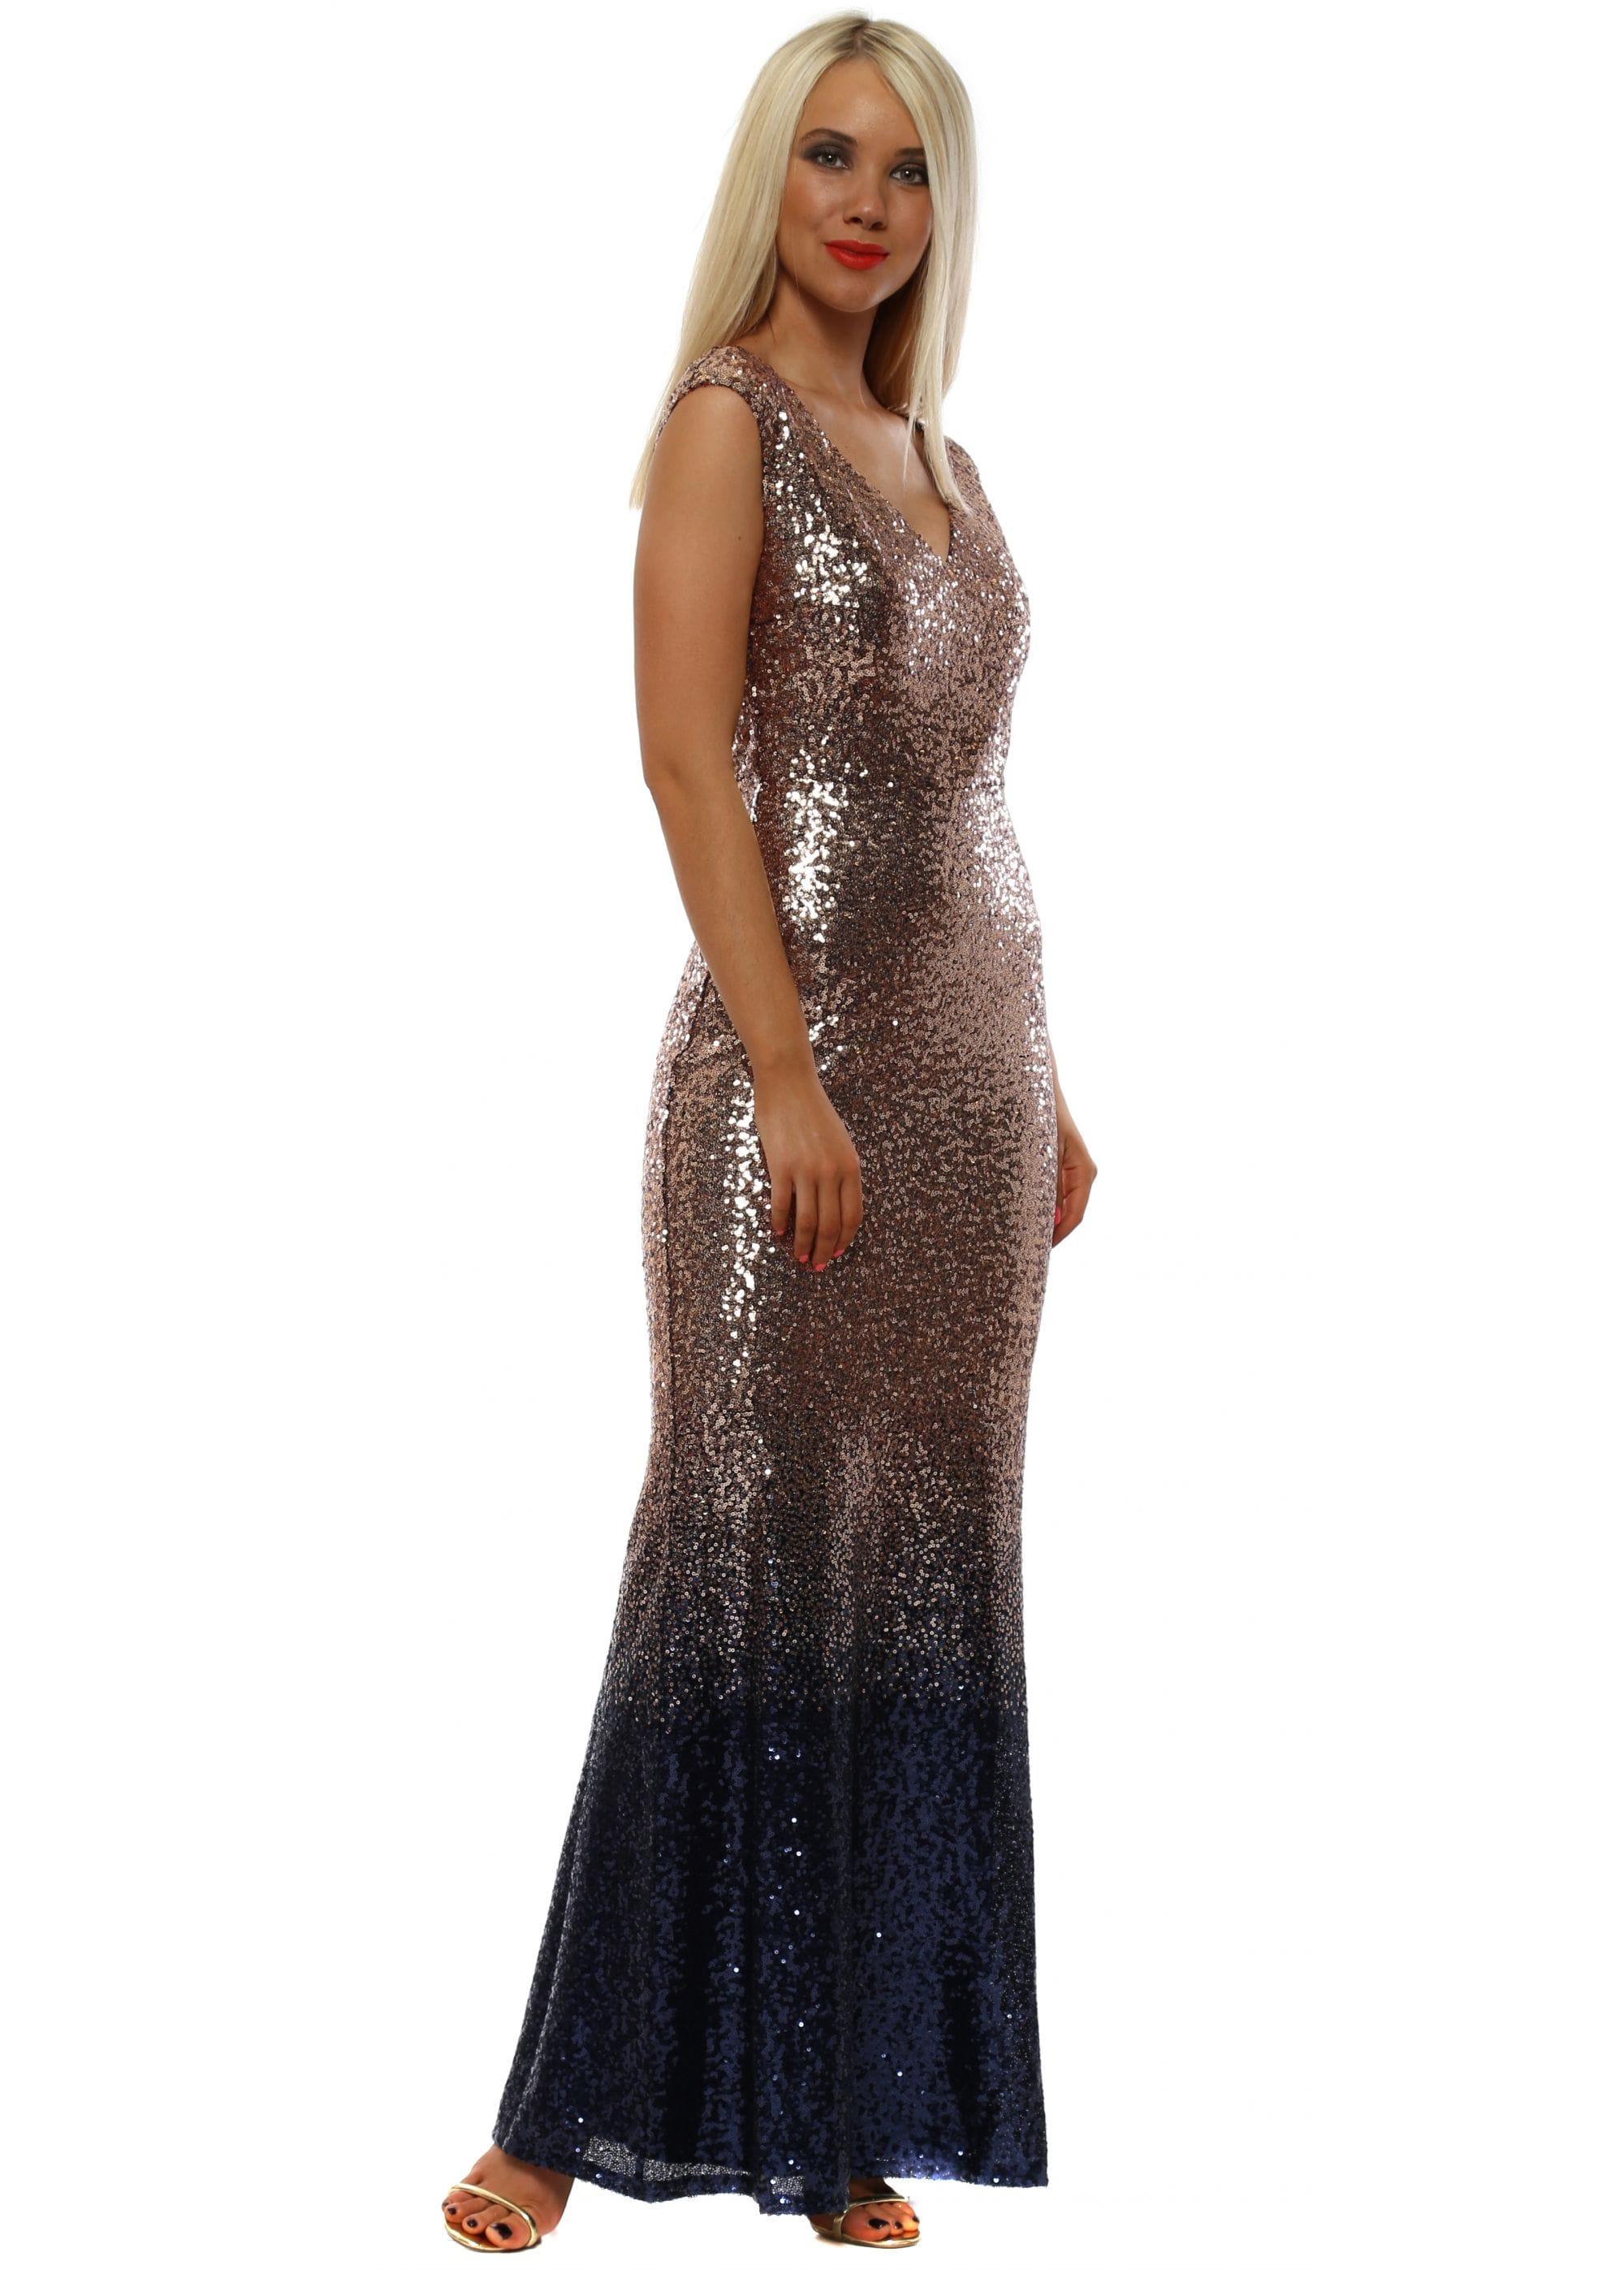 8329c2e95f Stephanie Pratt Champagne Ombre Sequinned Maxi Dress